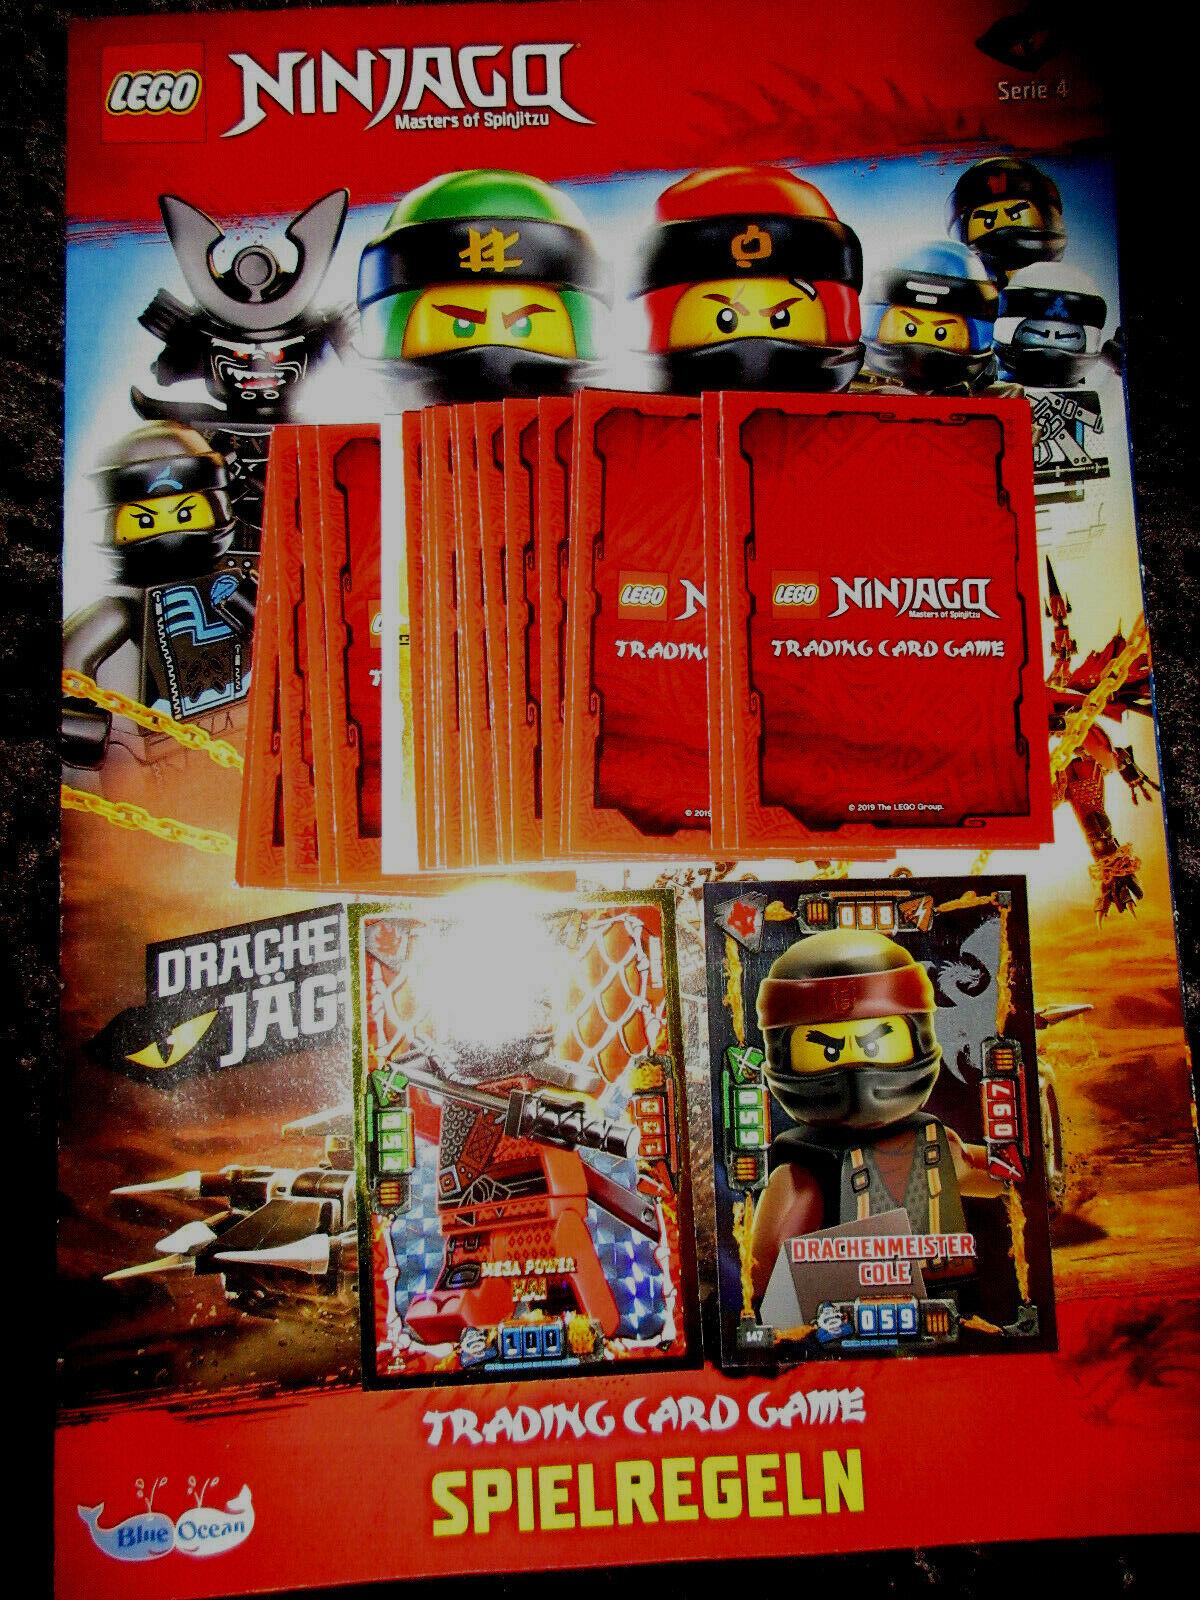 Serie 3: LLOYD 7 x TRADING CARD XXL JAY GARMADON Lego Ninjago KILLOW KAI